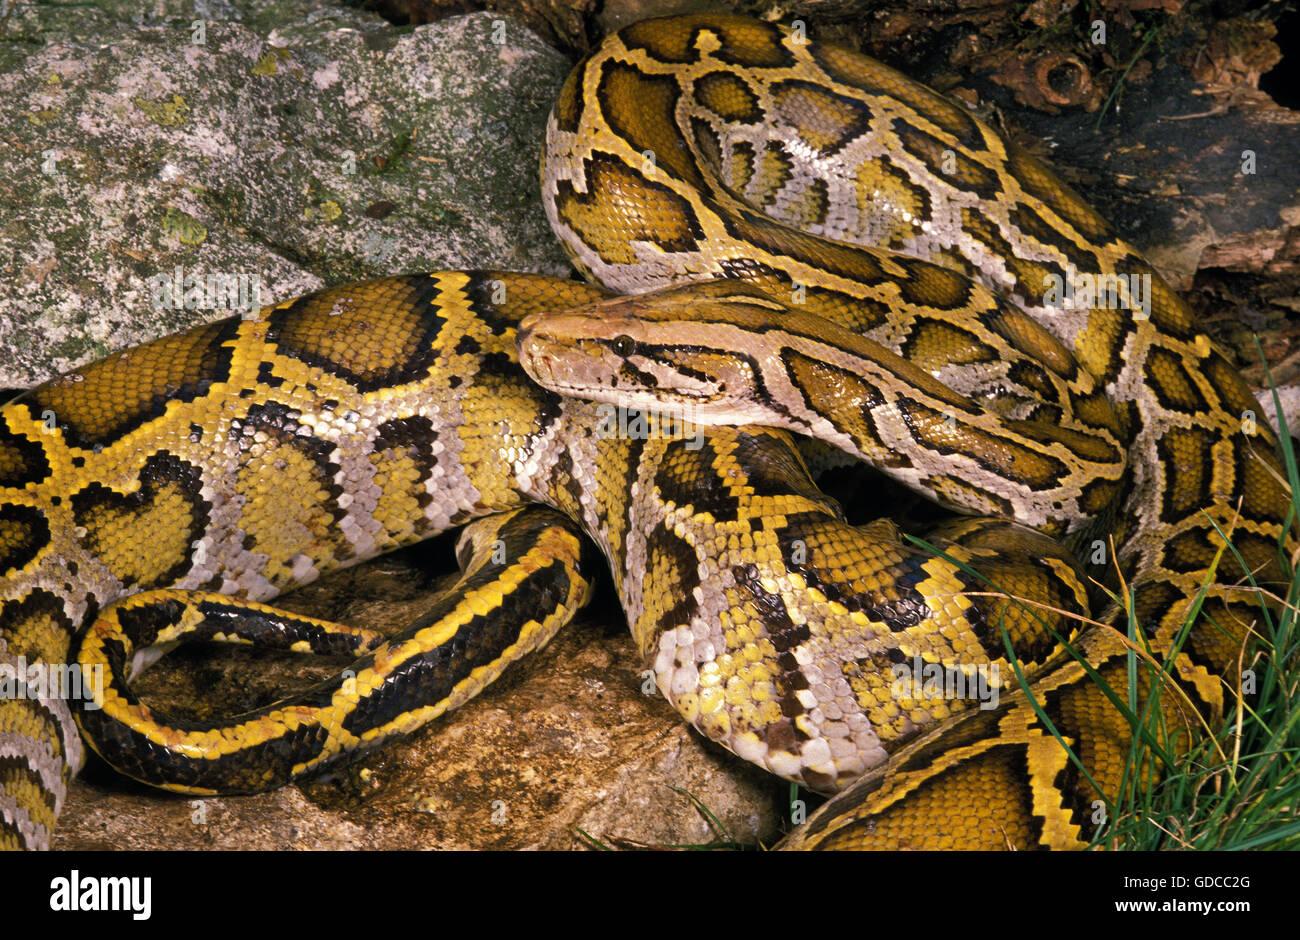 INDIAN PYTHON Python molurus Foto de stock